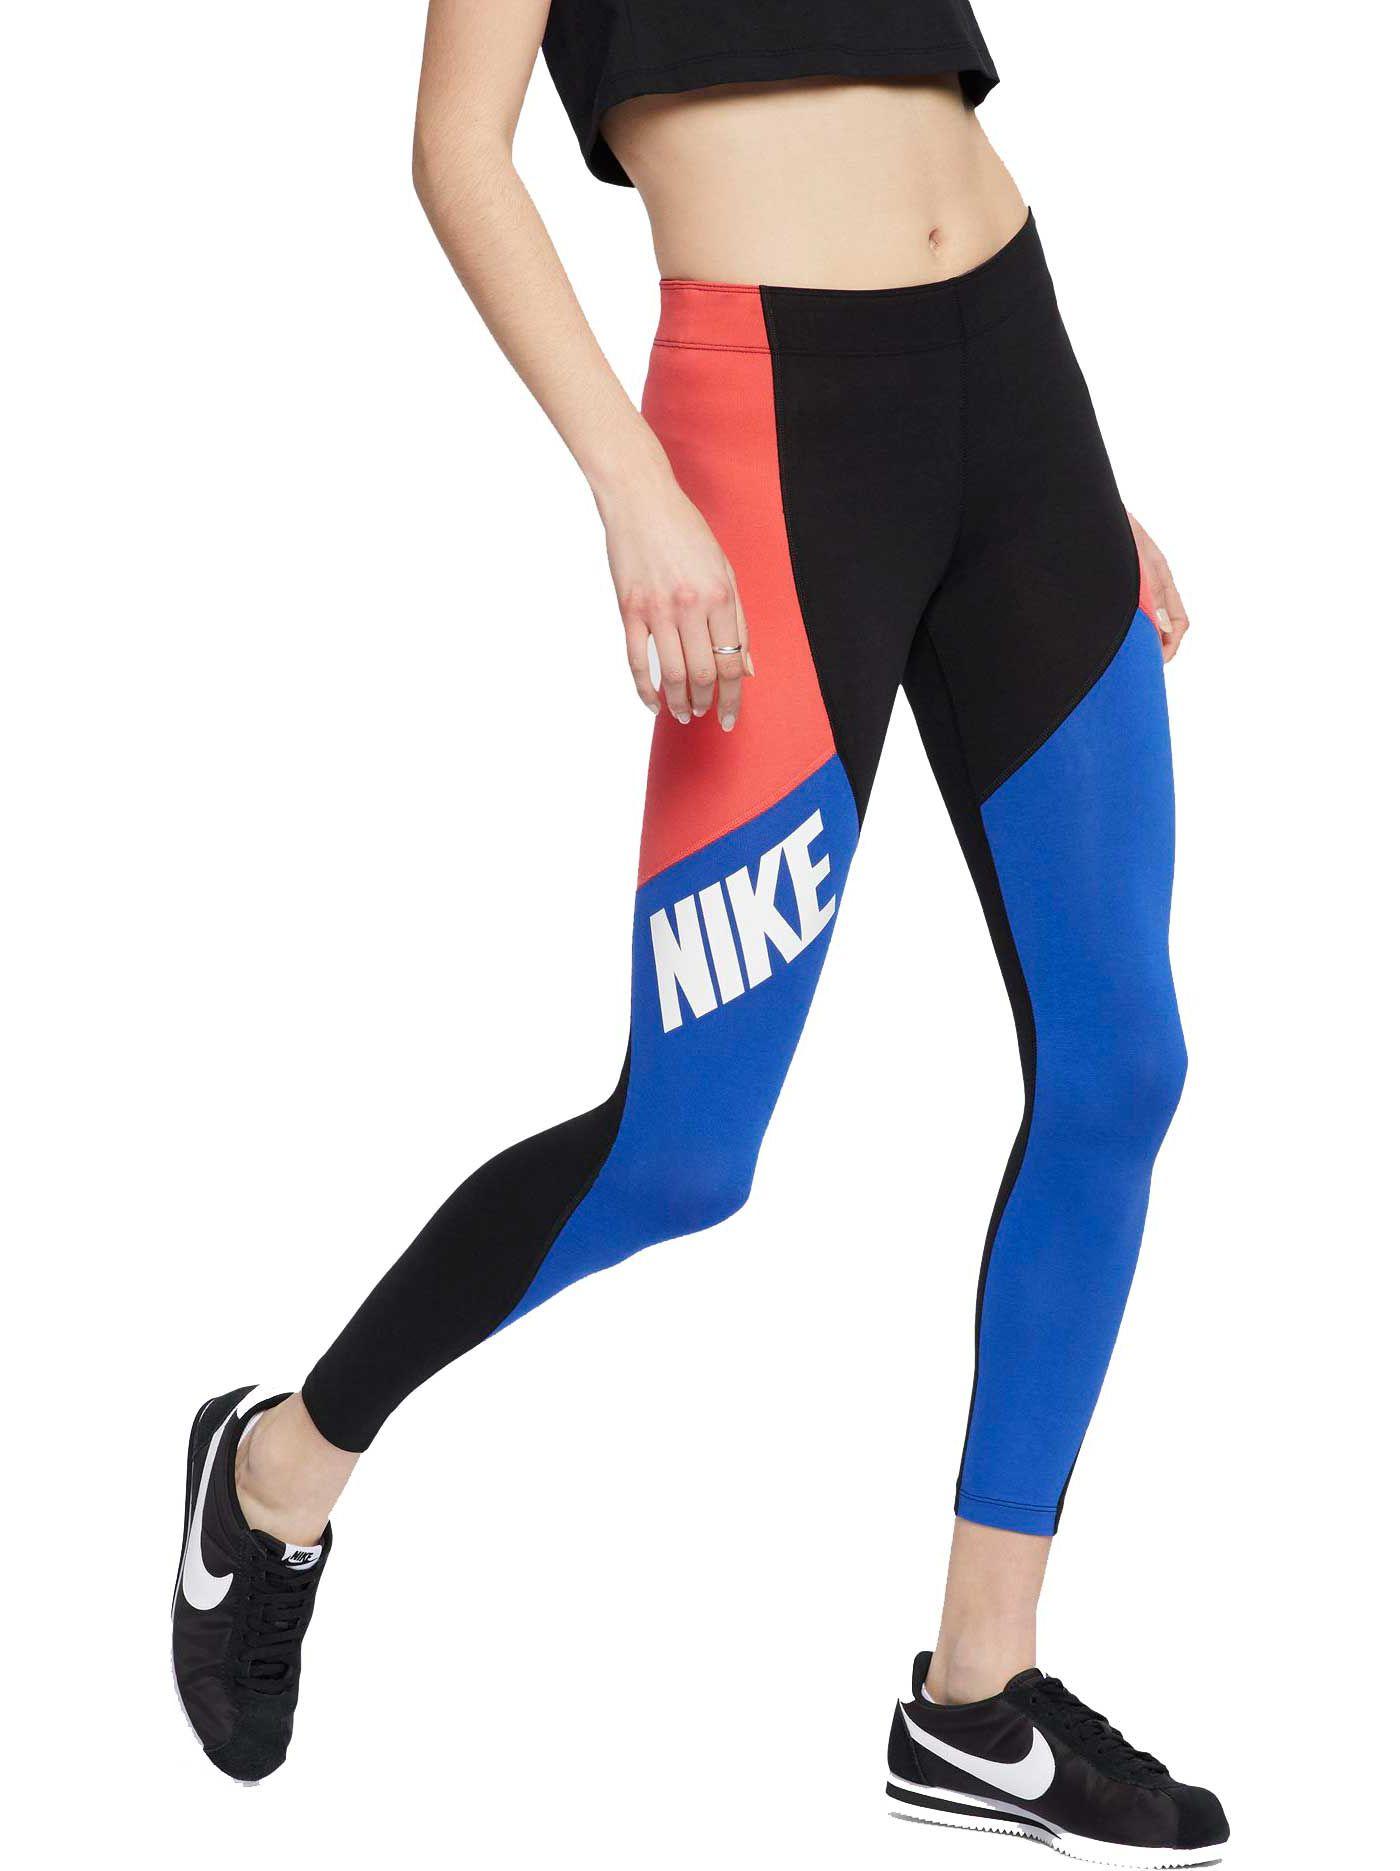 Nike Women's Colorblock Leg-A-See Leggings